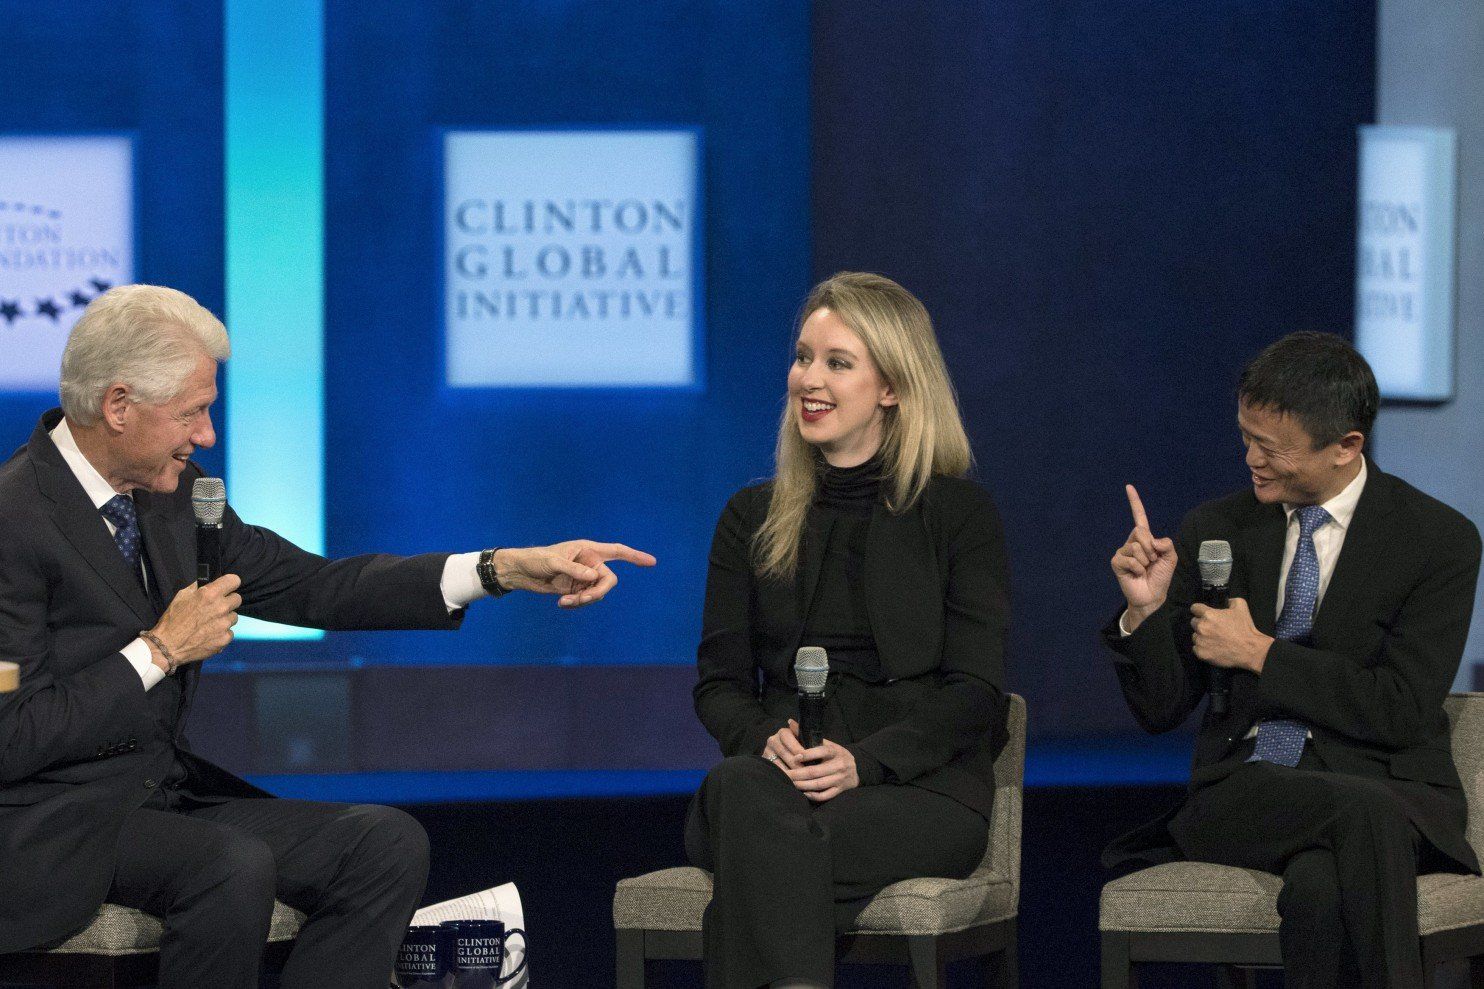 Clinton Donor Obama Entrepreneurship Ambassador Charged With Massive Fraud